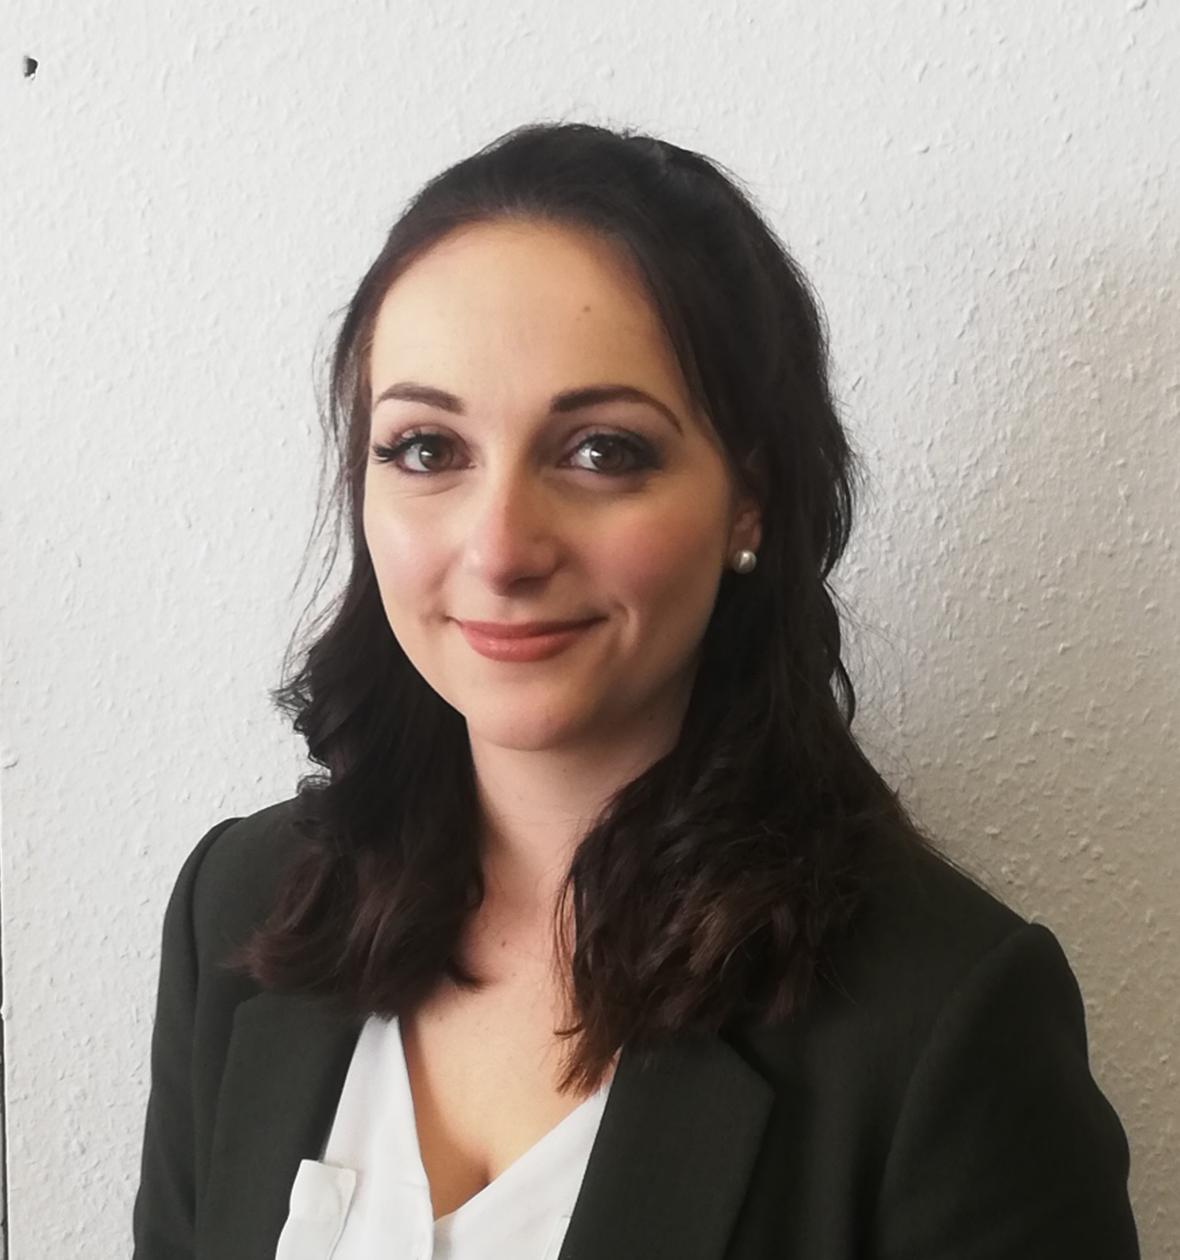 Lina-Marie Vosseler